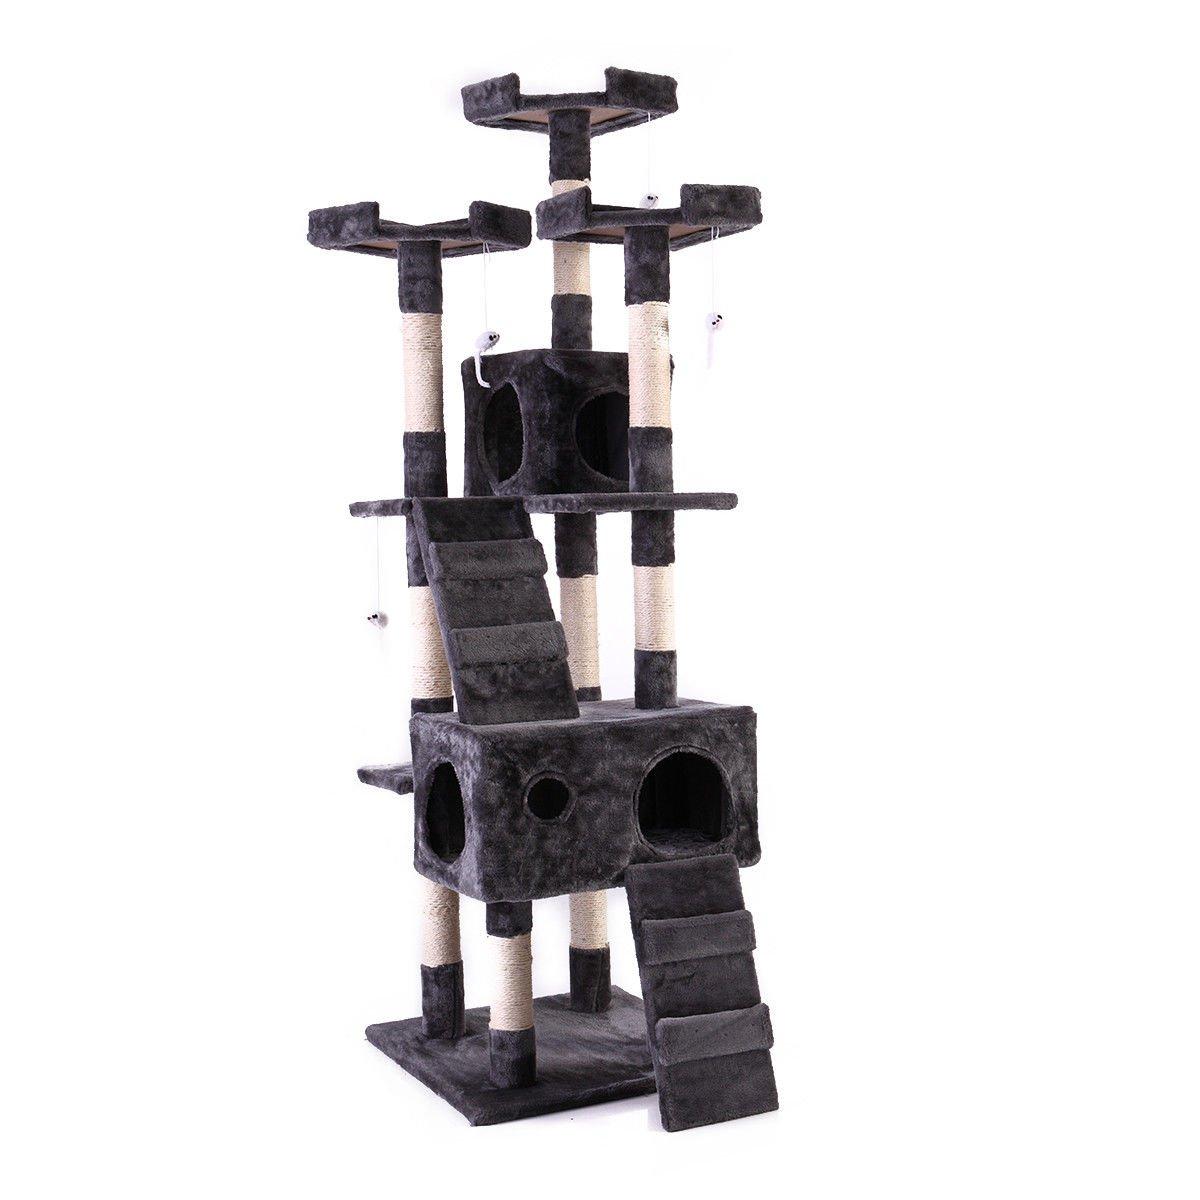 Tobbi 67'' Cat Tree Tower Condo Play House Pet Scratch Post Kitten Furniture Grey